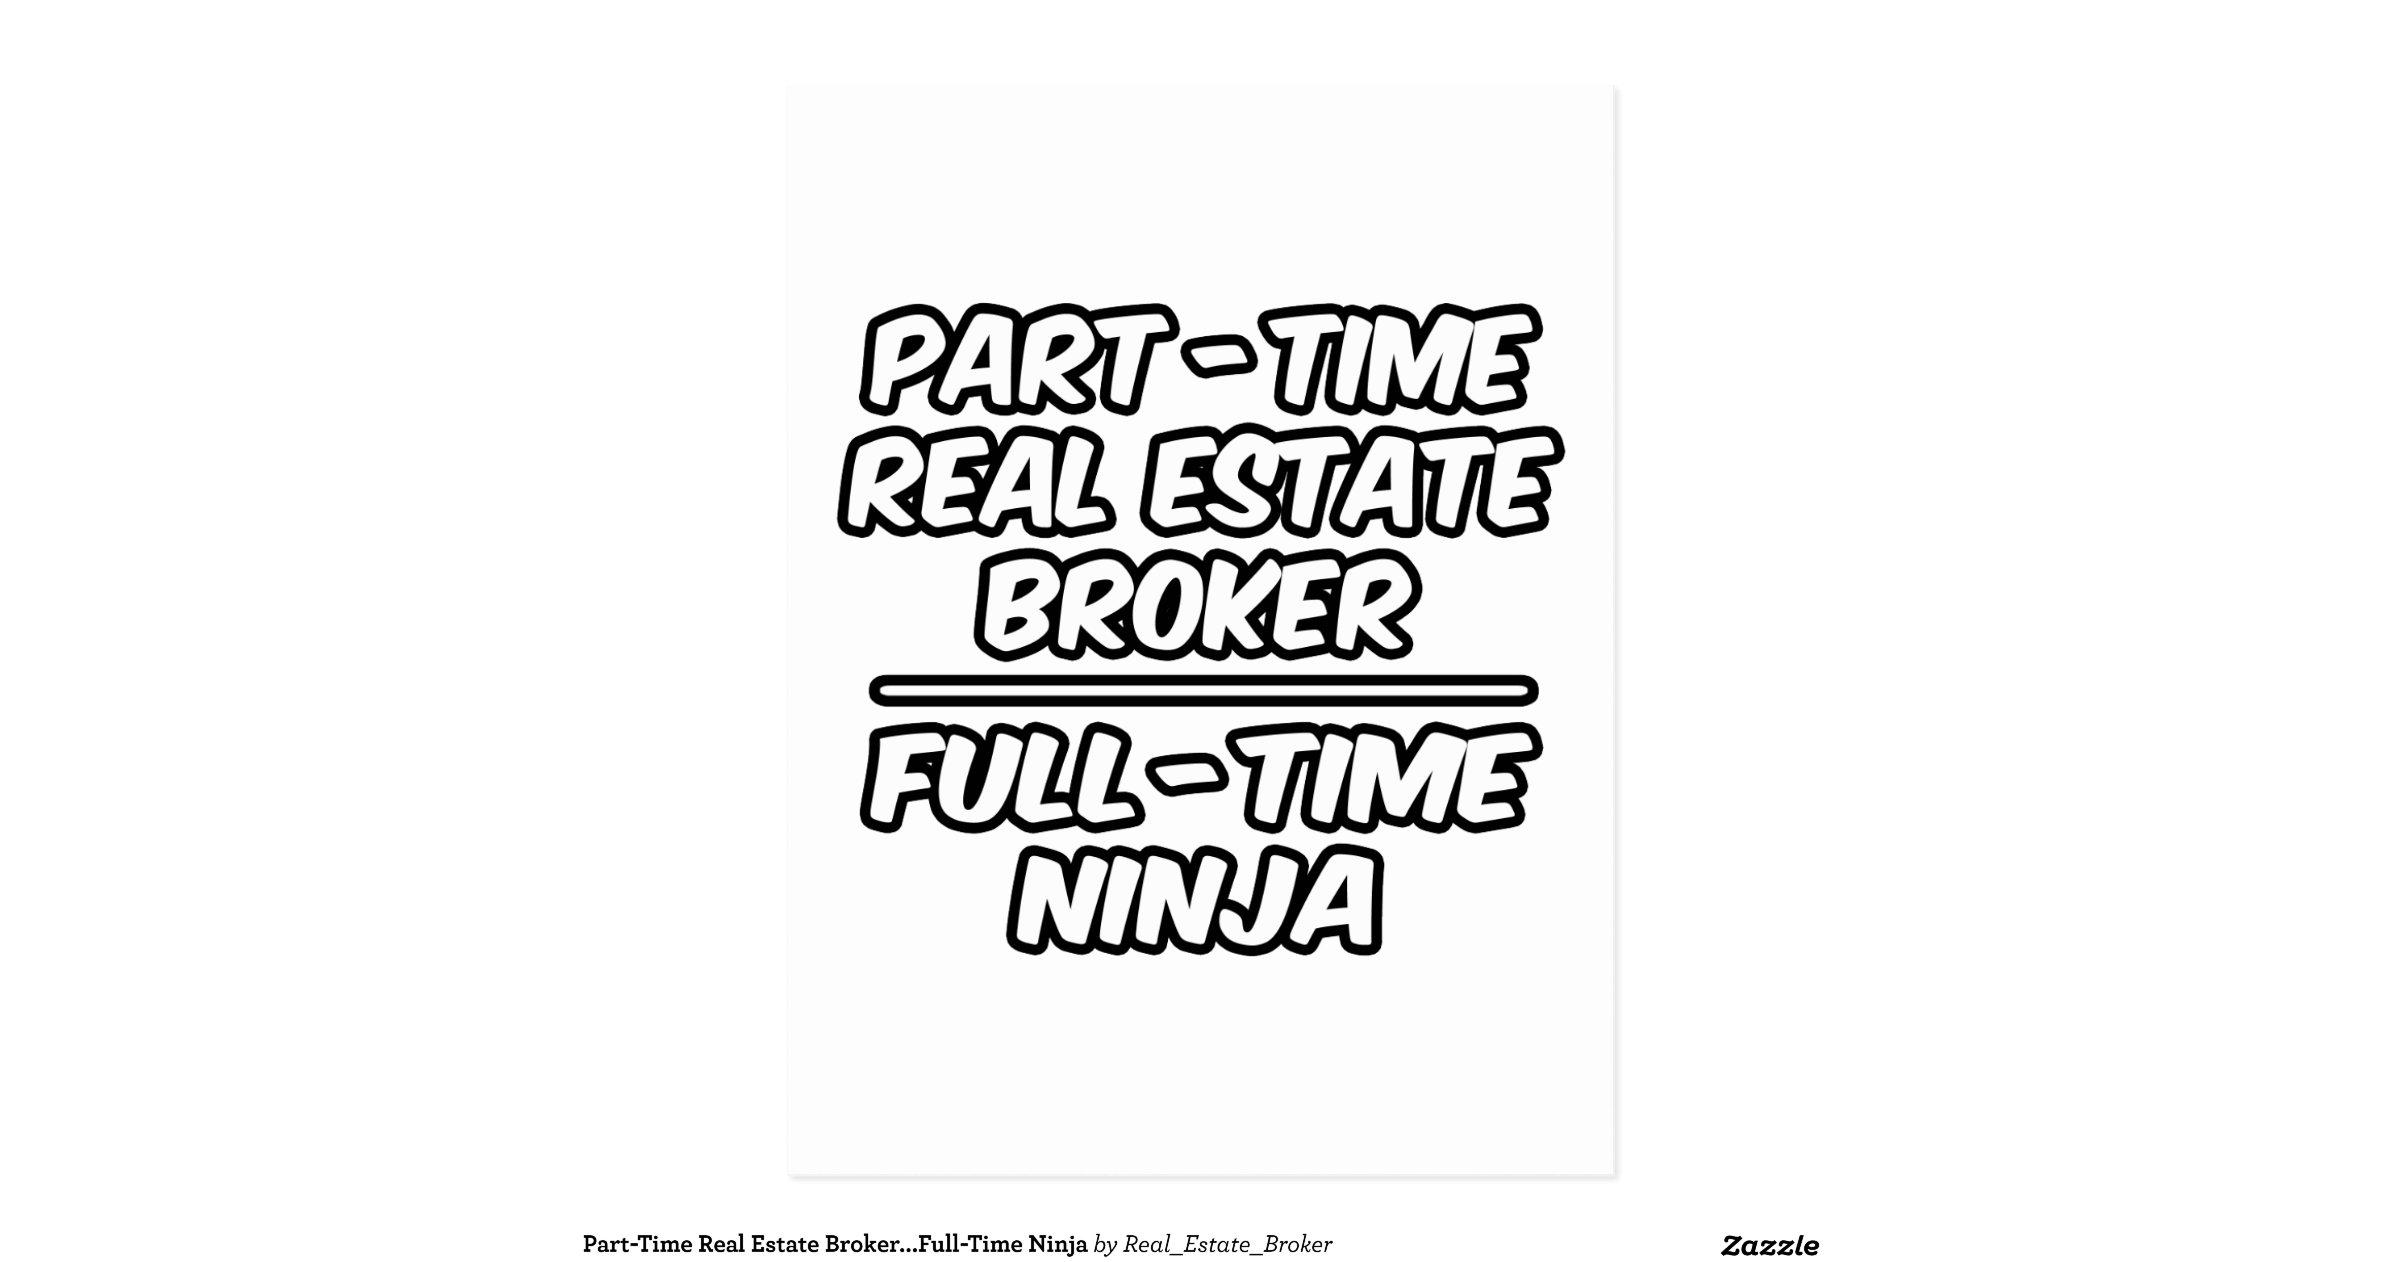 Broker time